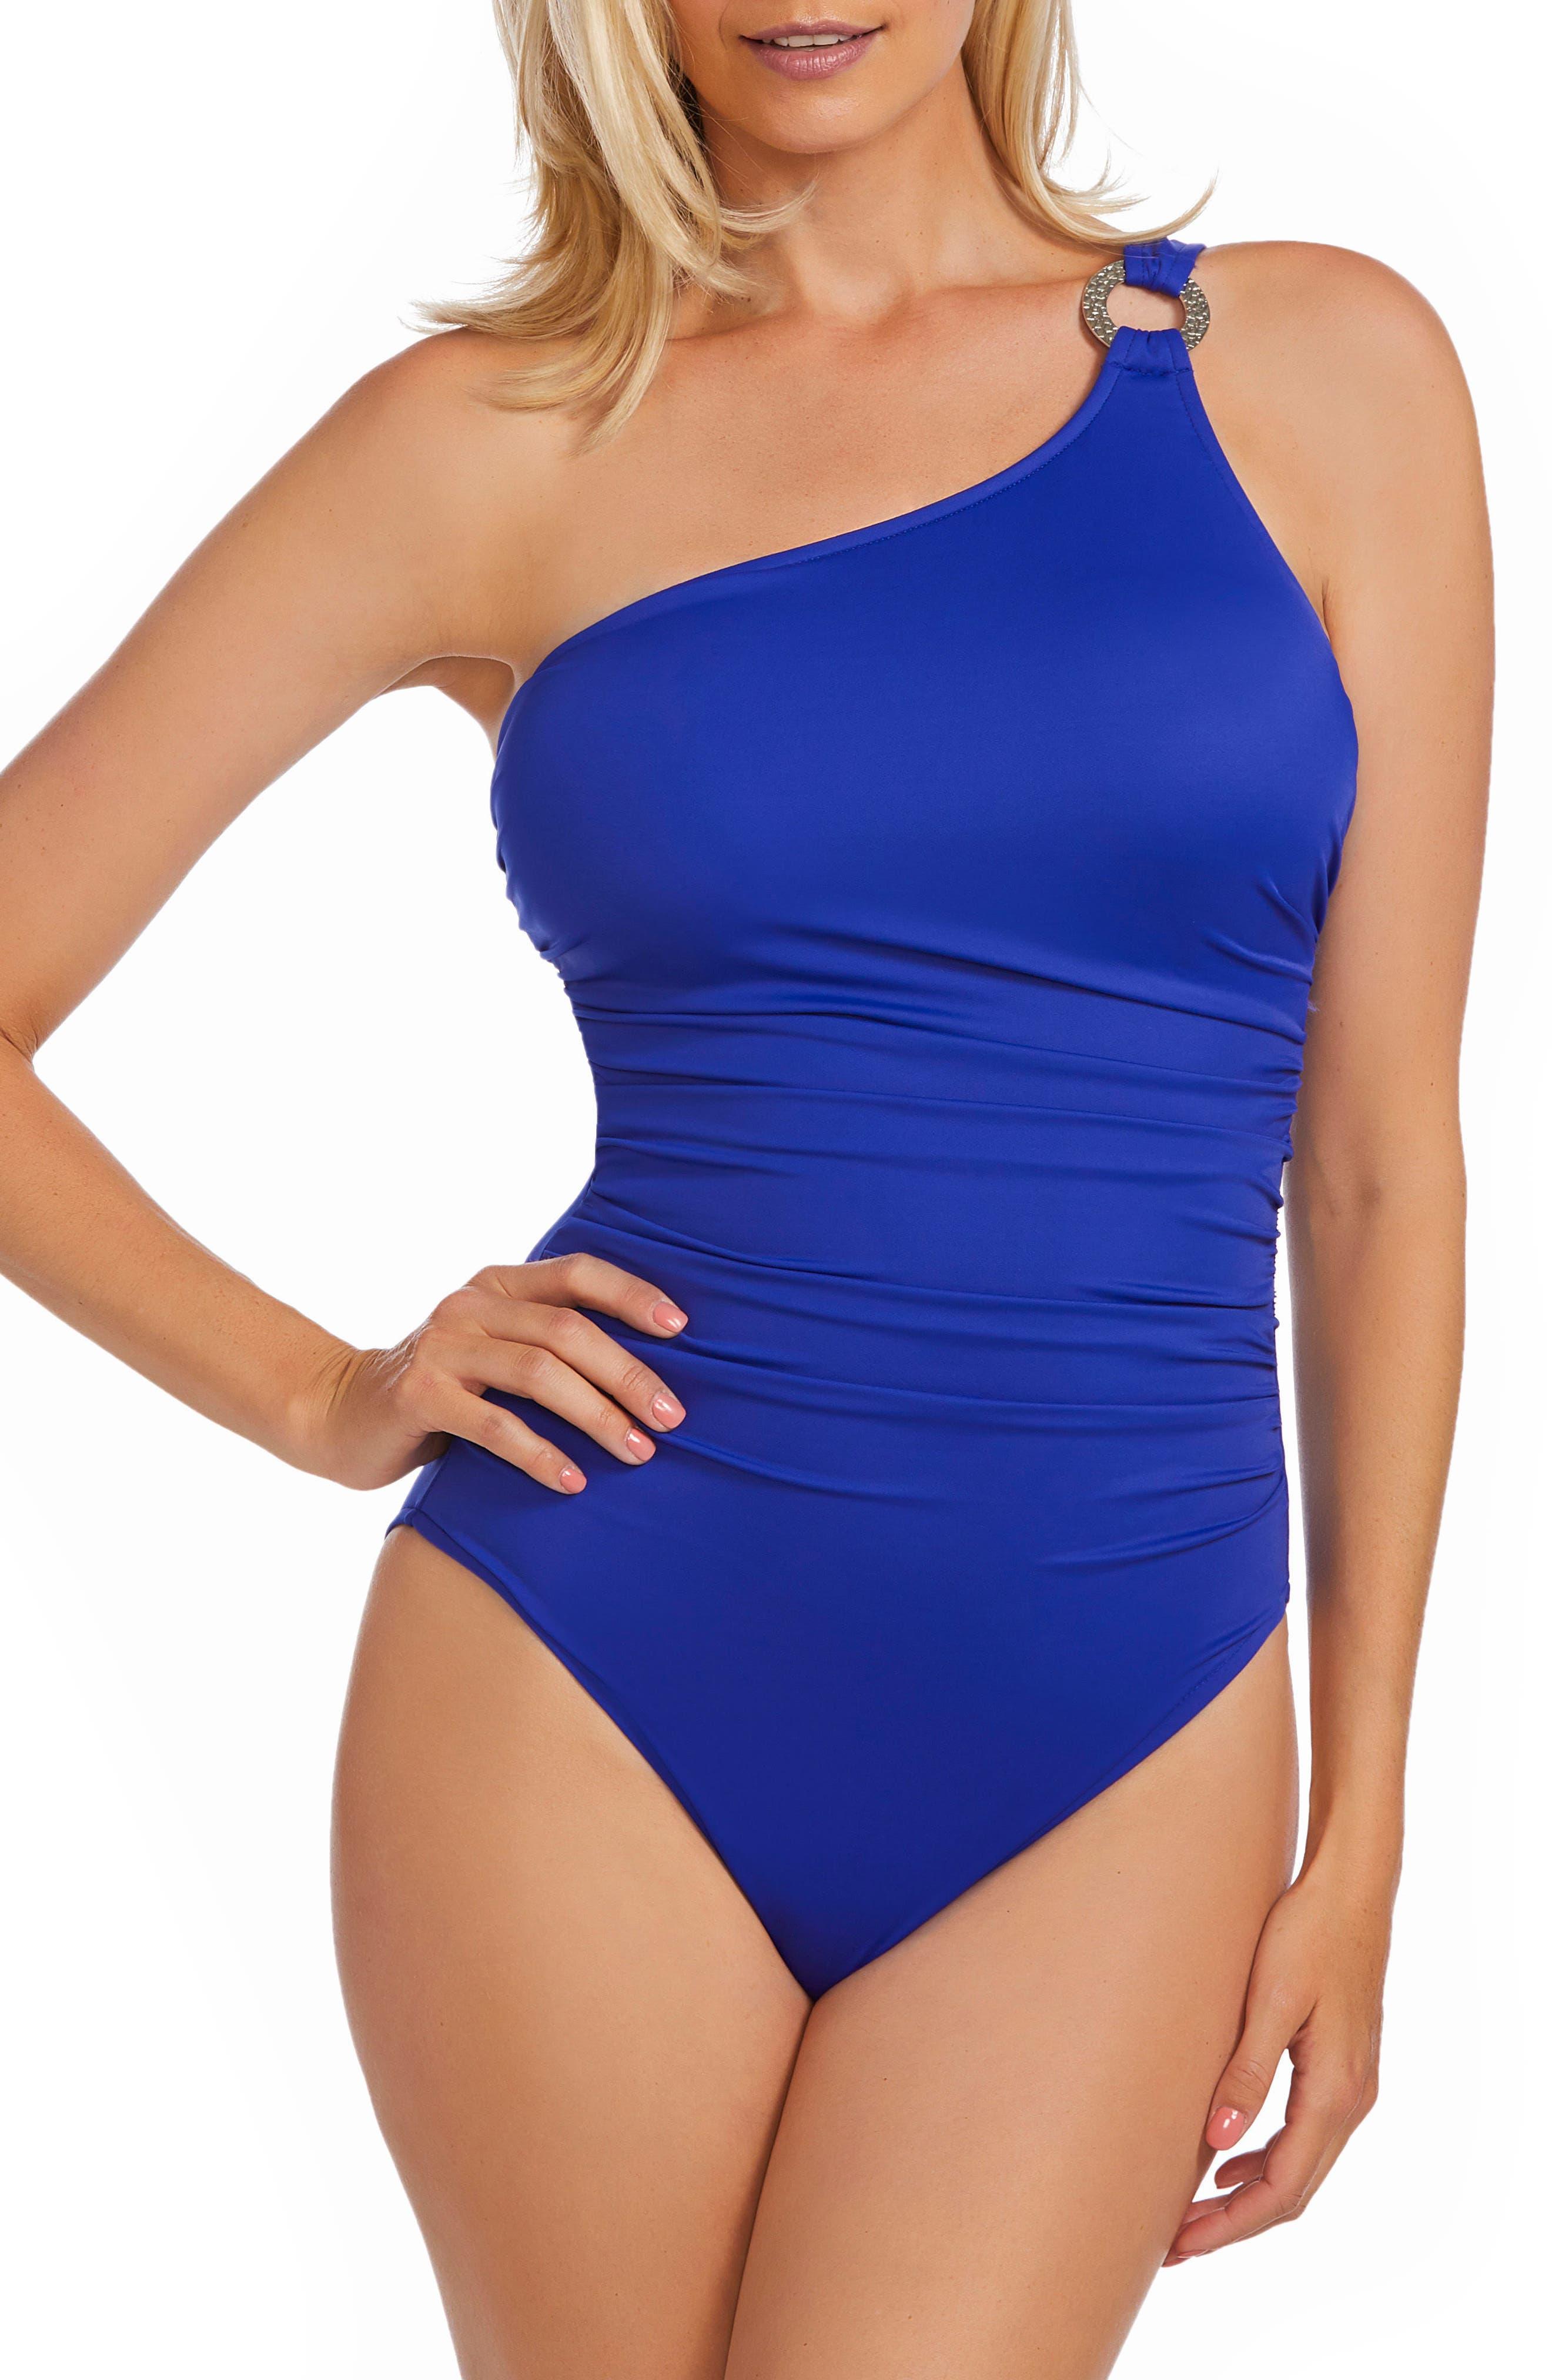 Janie One-Shoulder One-Piece Swimsuit,                             Main thumbnail 1, color,                             409